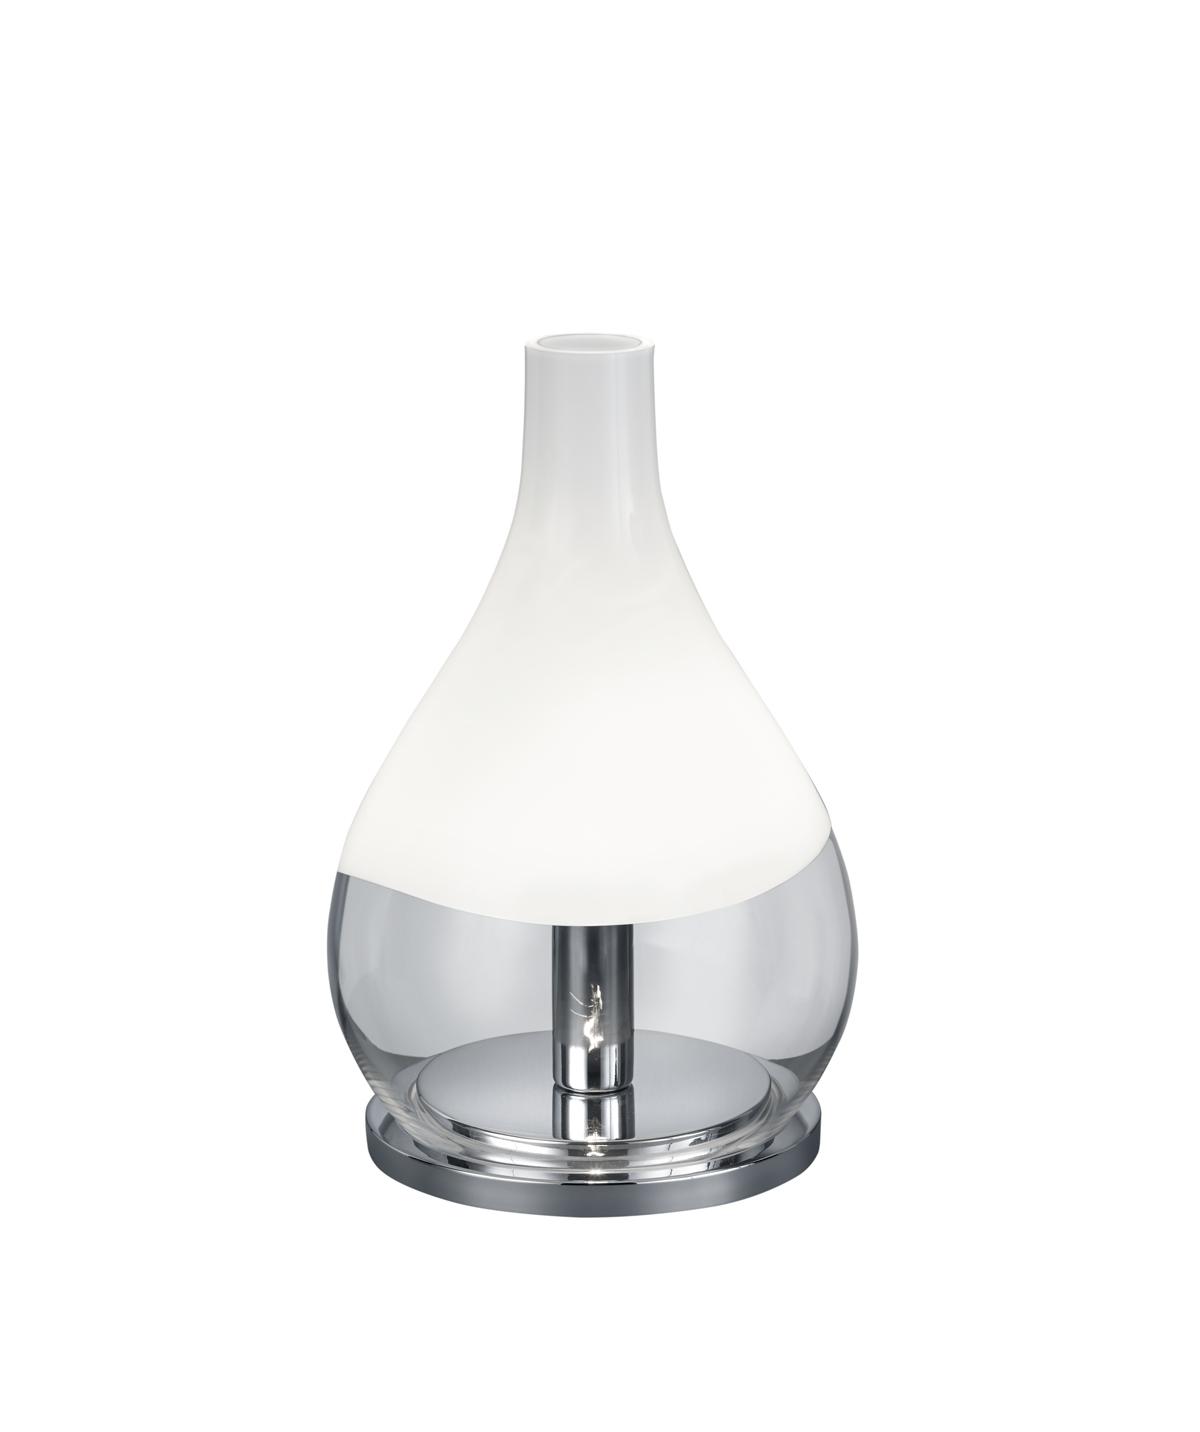 Trio Kingston asztali lámpa